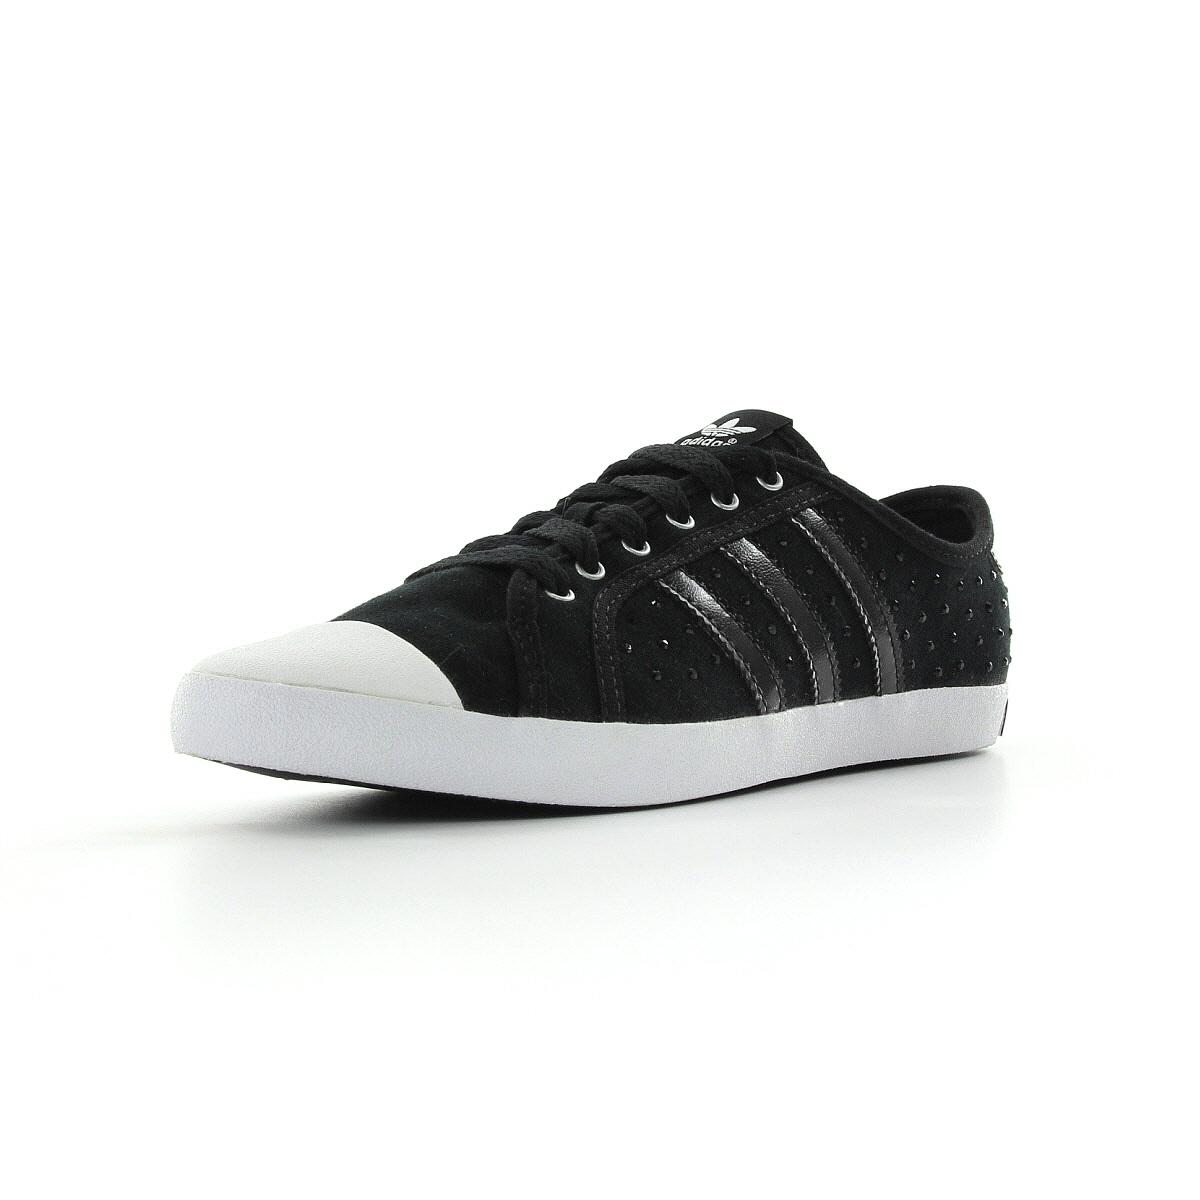 pin adidas adria low sleek w ref v24146 chaussures femme baskets mode on pinterest. Black Bedroom Furniture Sets. Home Design Ideas